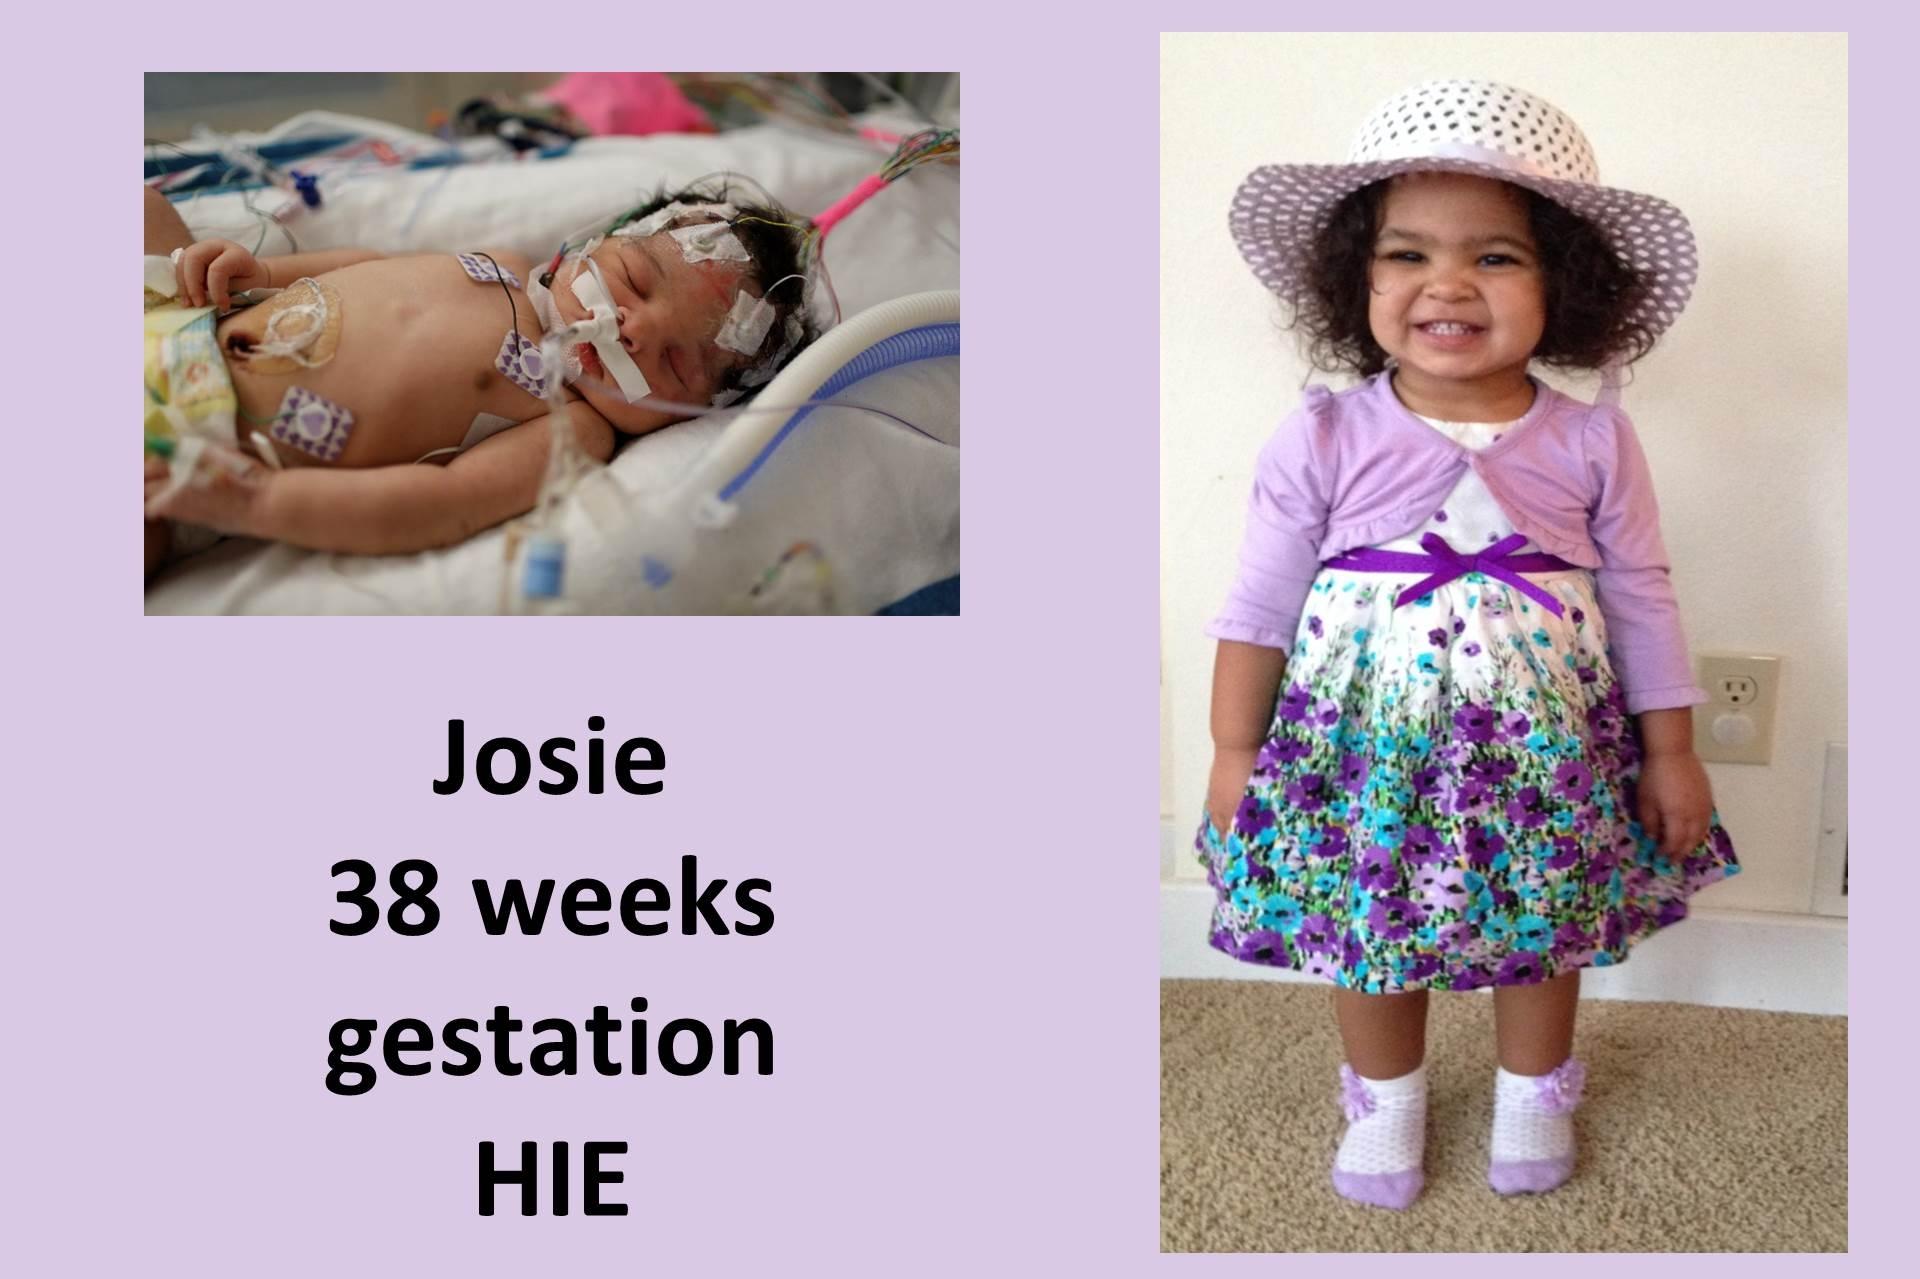 Hallway of Hope: Josie